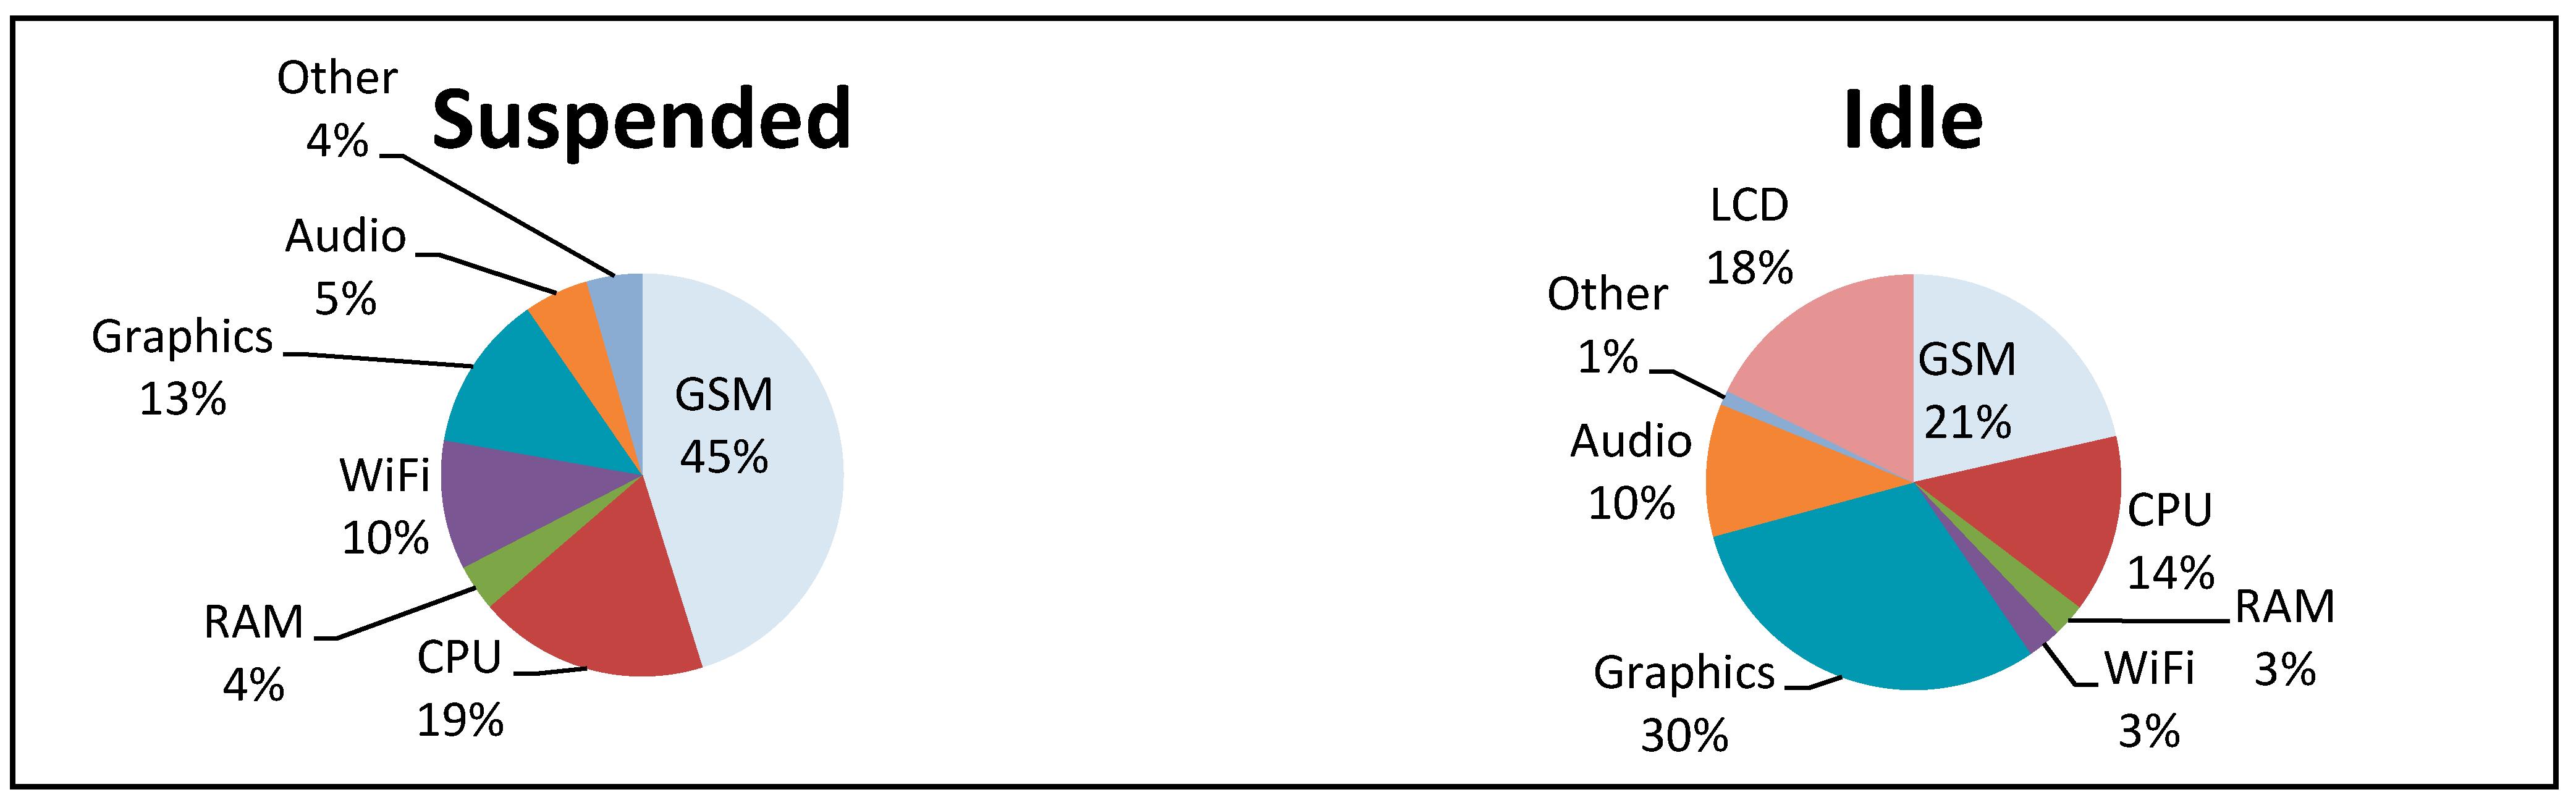 Binary option trading community 100 windows 7